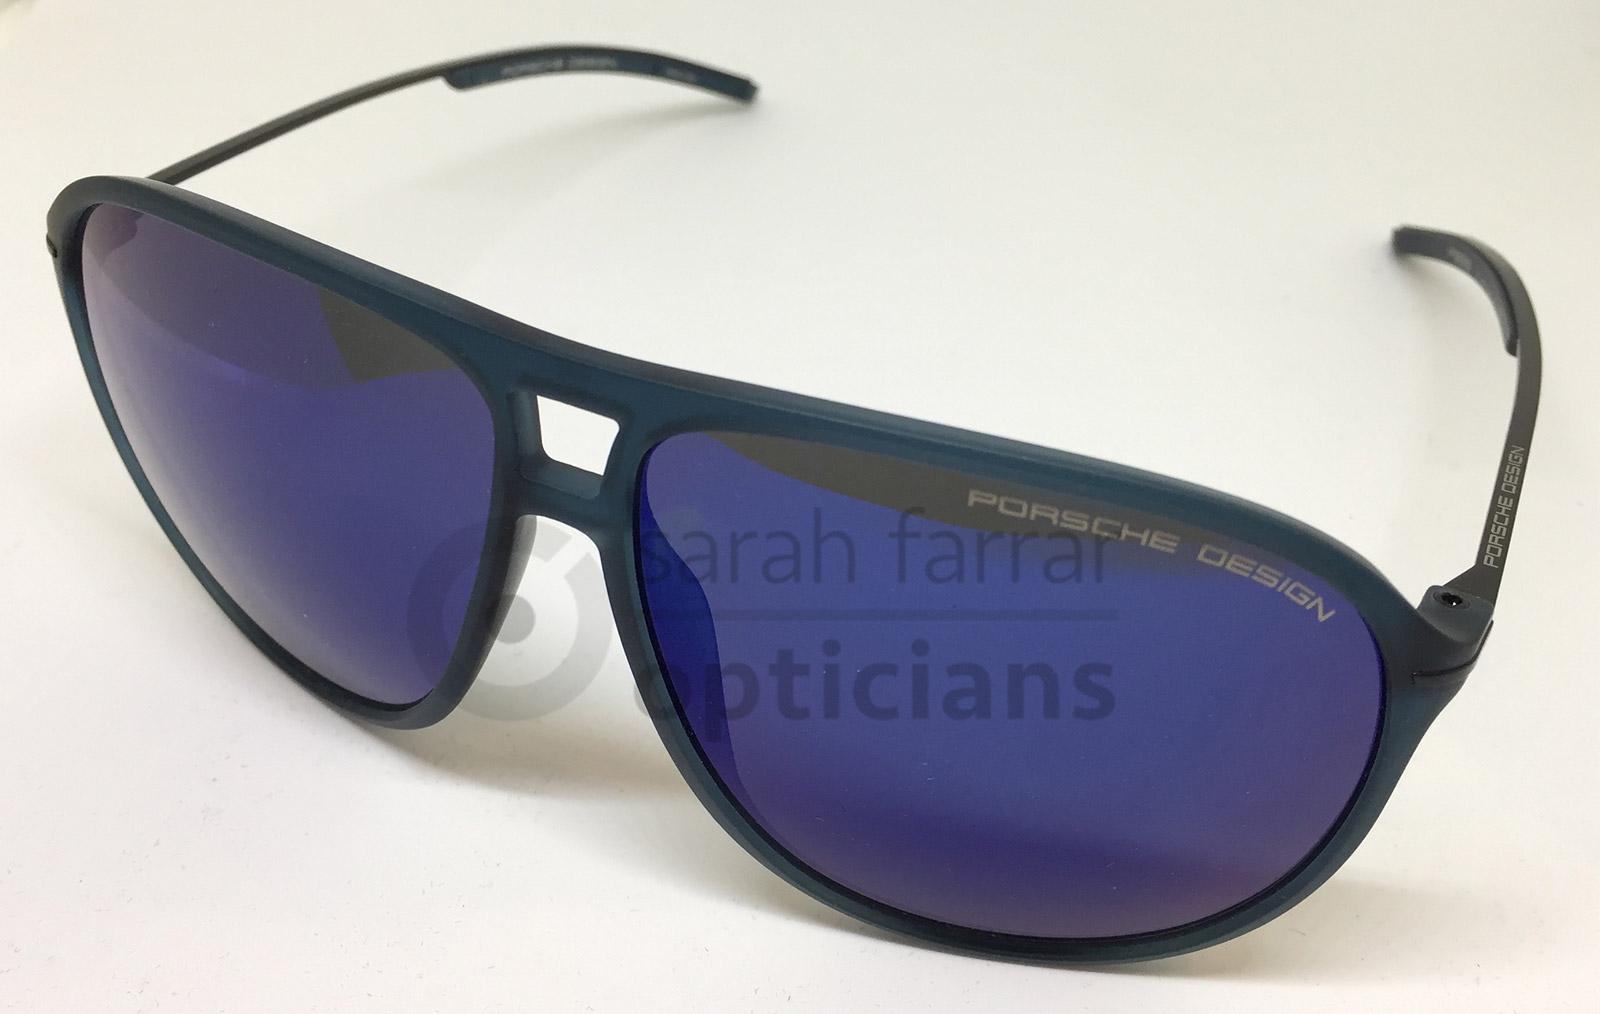 Porsche Design P8635 Sunglasses Sarah Farrar Opticians